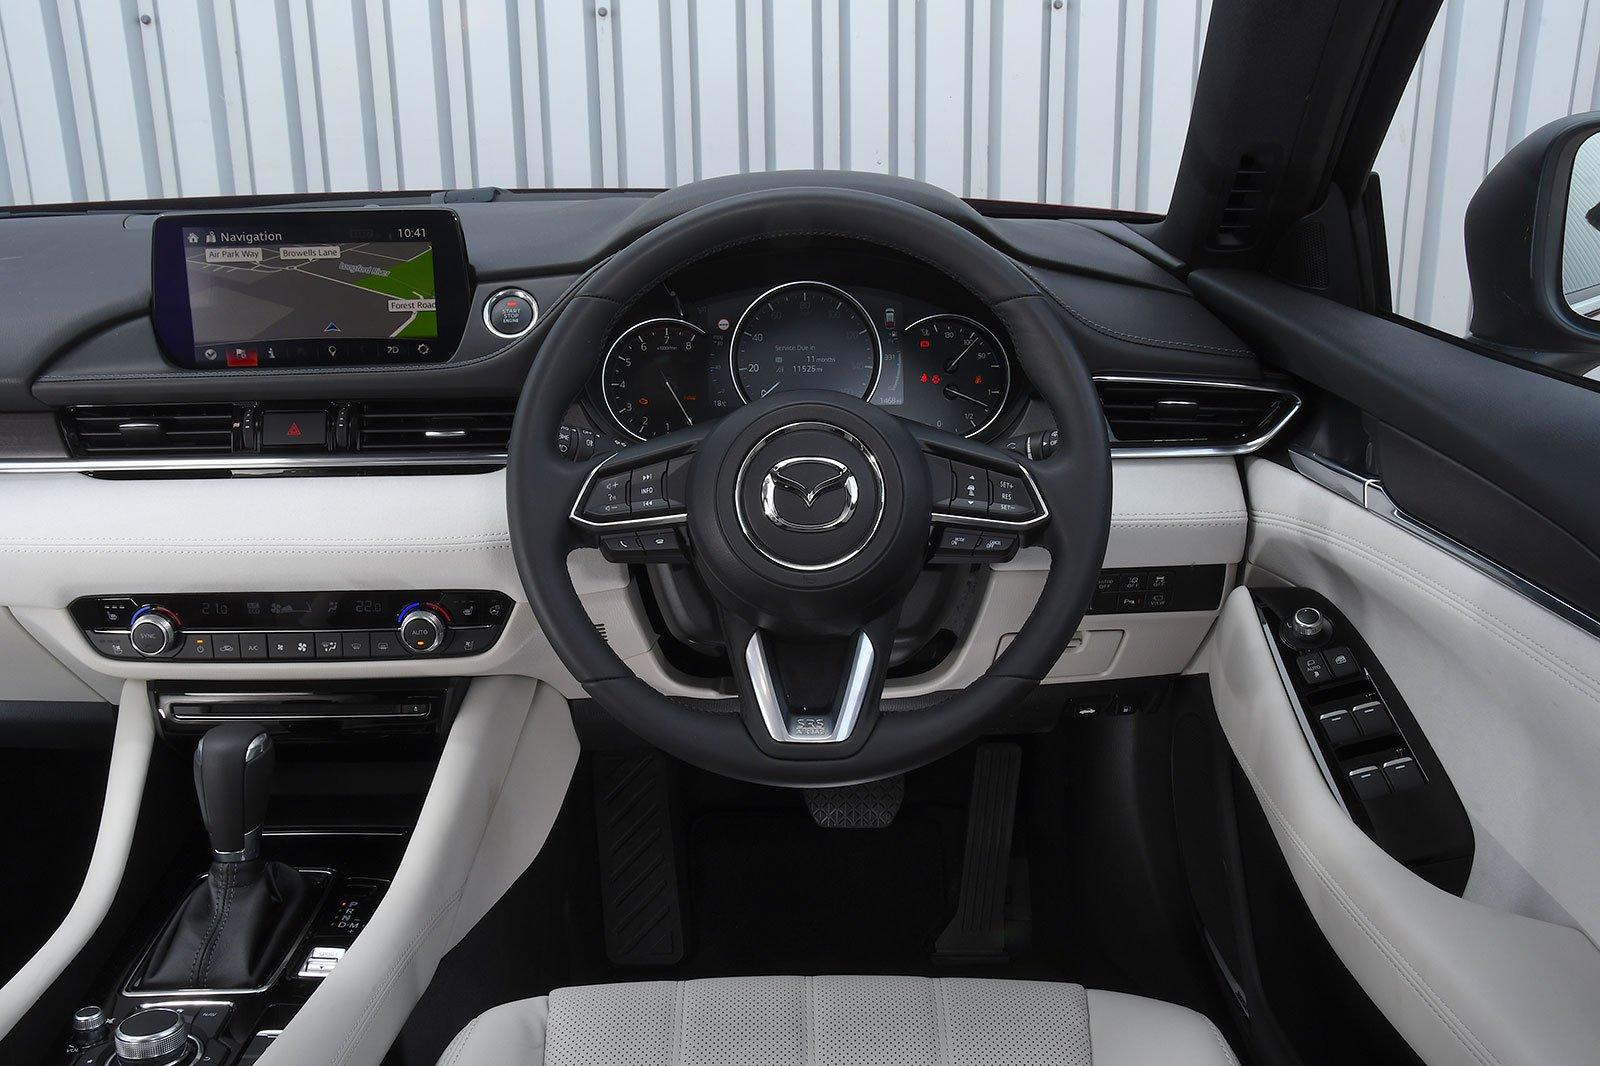 Mazda 6 Tourer 2.0 SE-L Lux Nav+ - interior